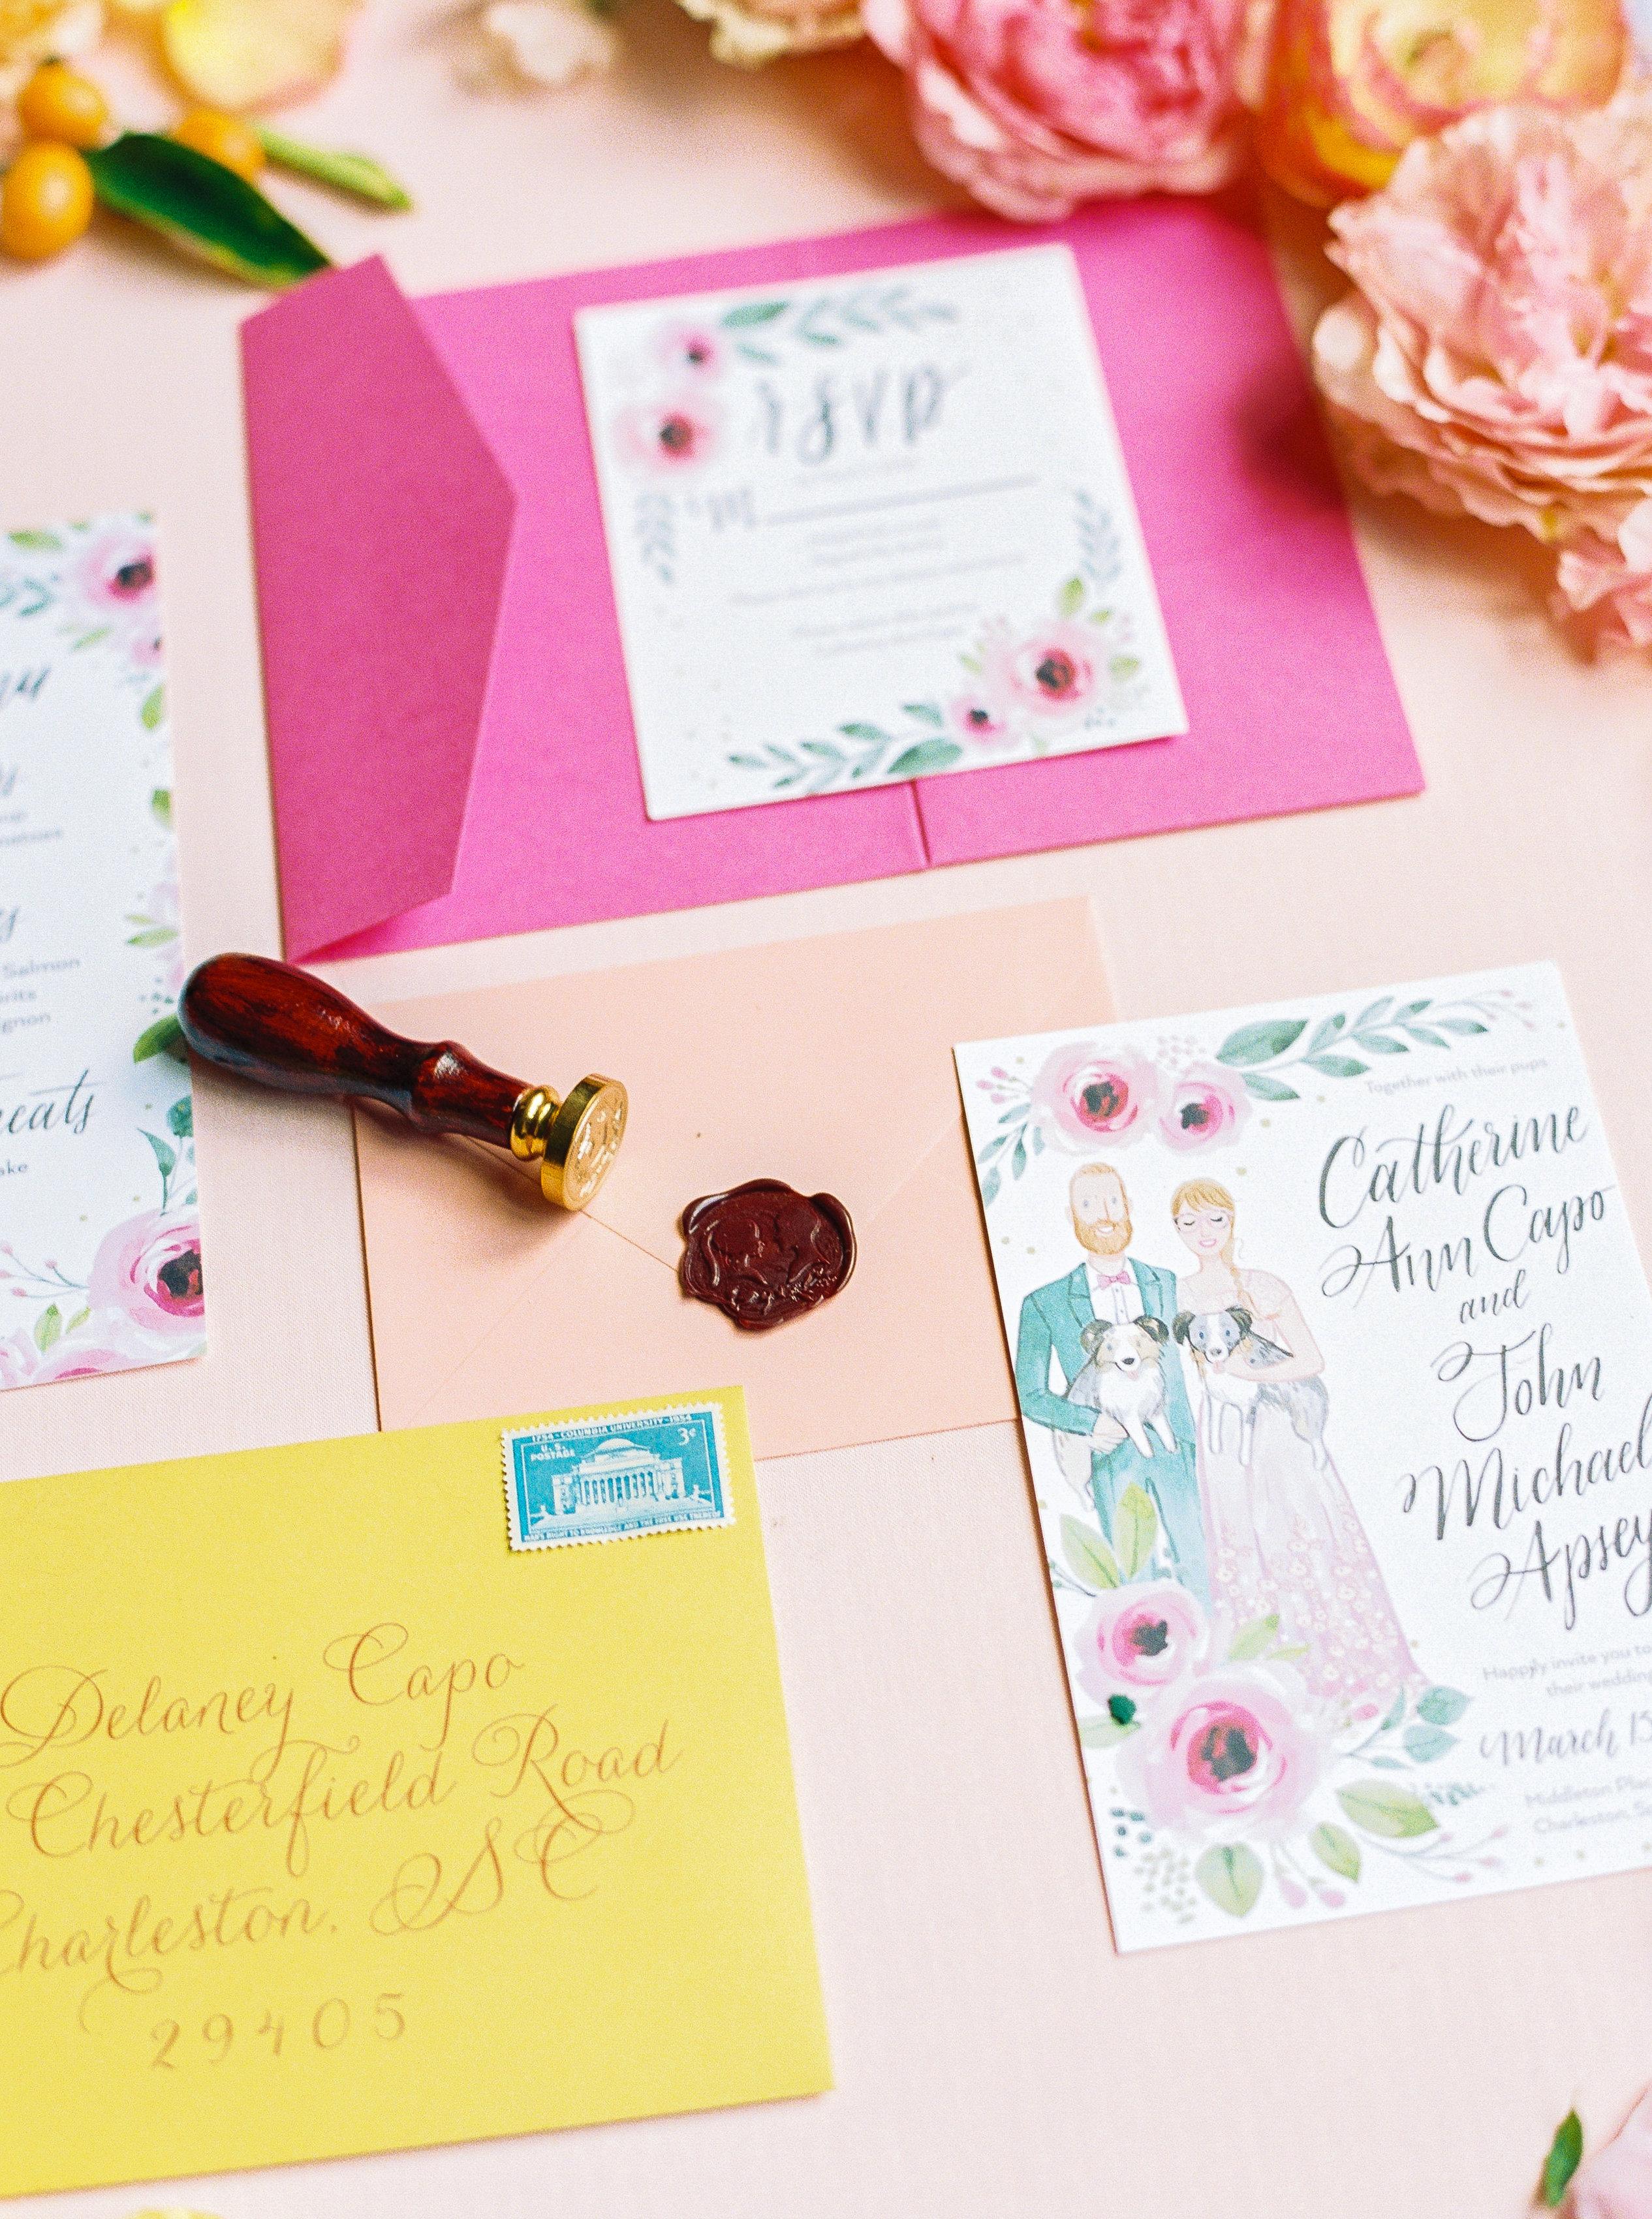 catherine john micro wedding invite perry vaile